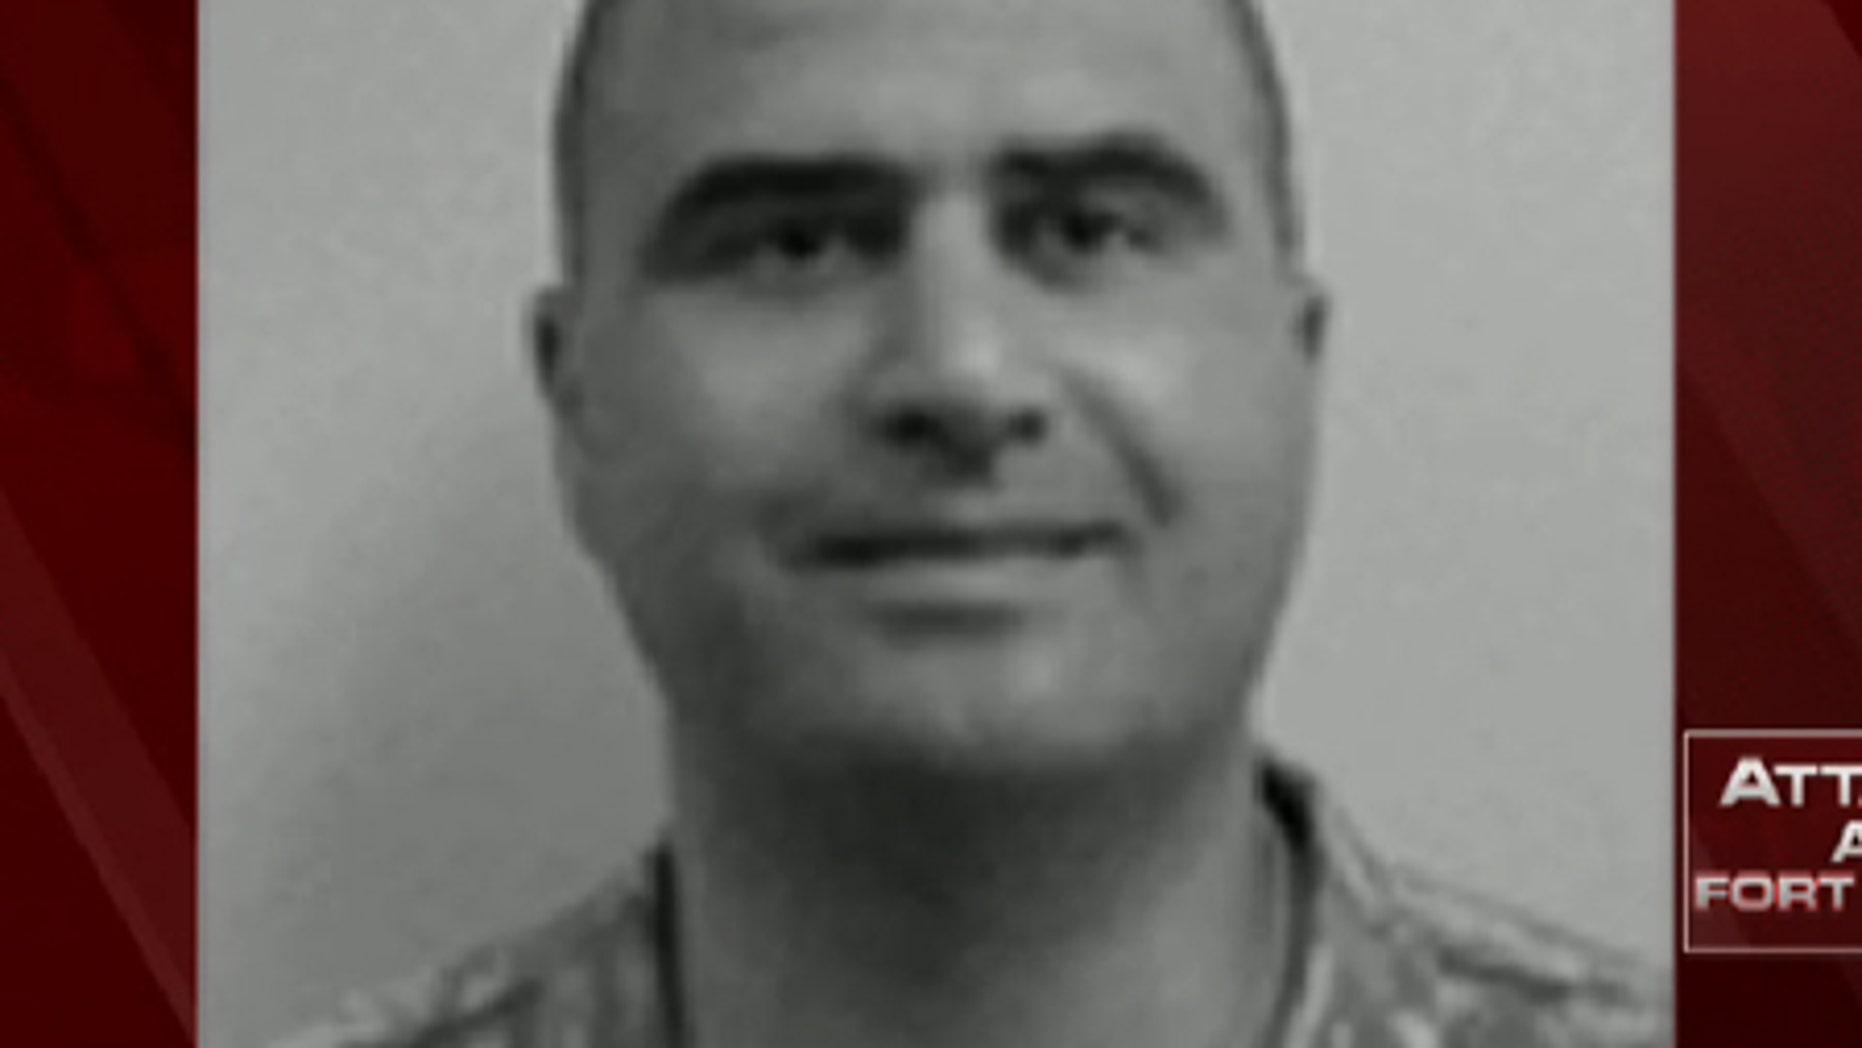 Fort Hood Alleged Shooter Army Maj. Nidal Malik Hasan